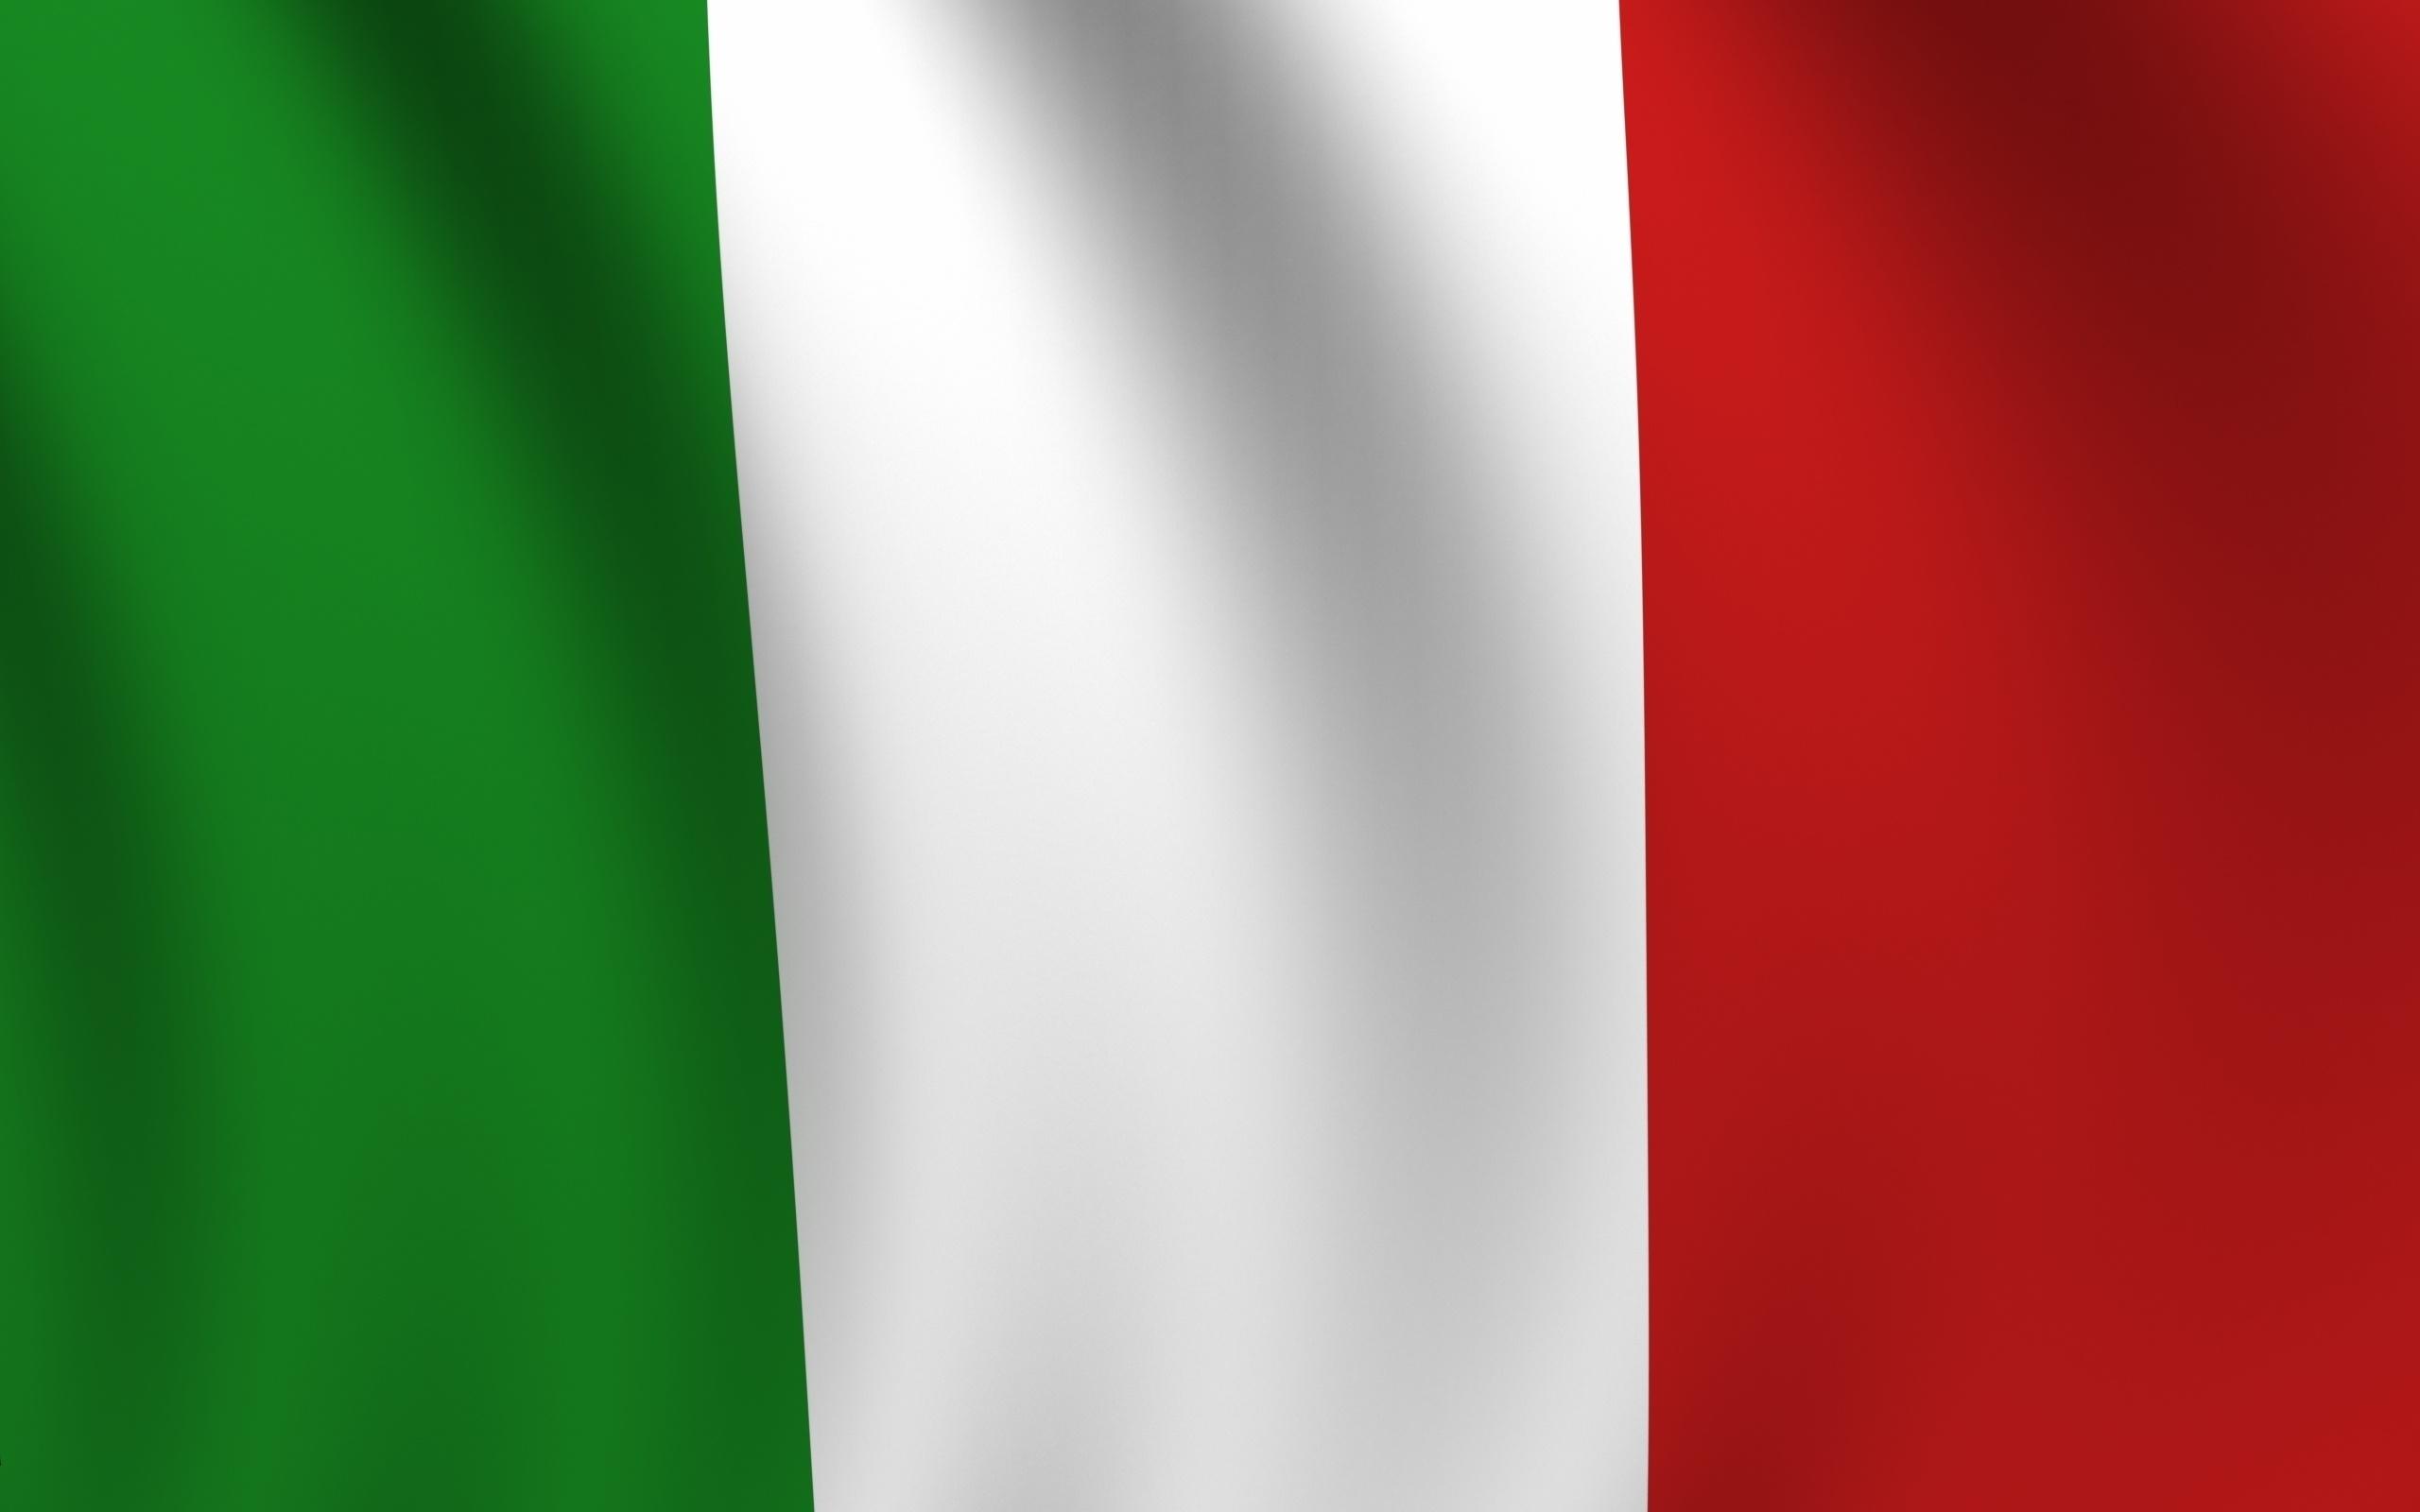 Italy Flag Wallpaper 46738 2560x1600px 2560x1600